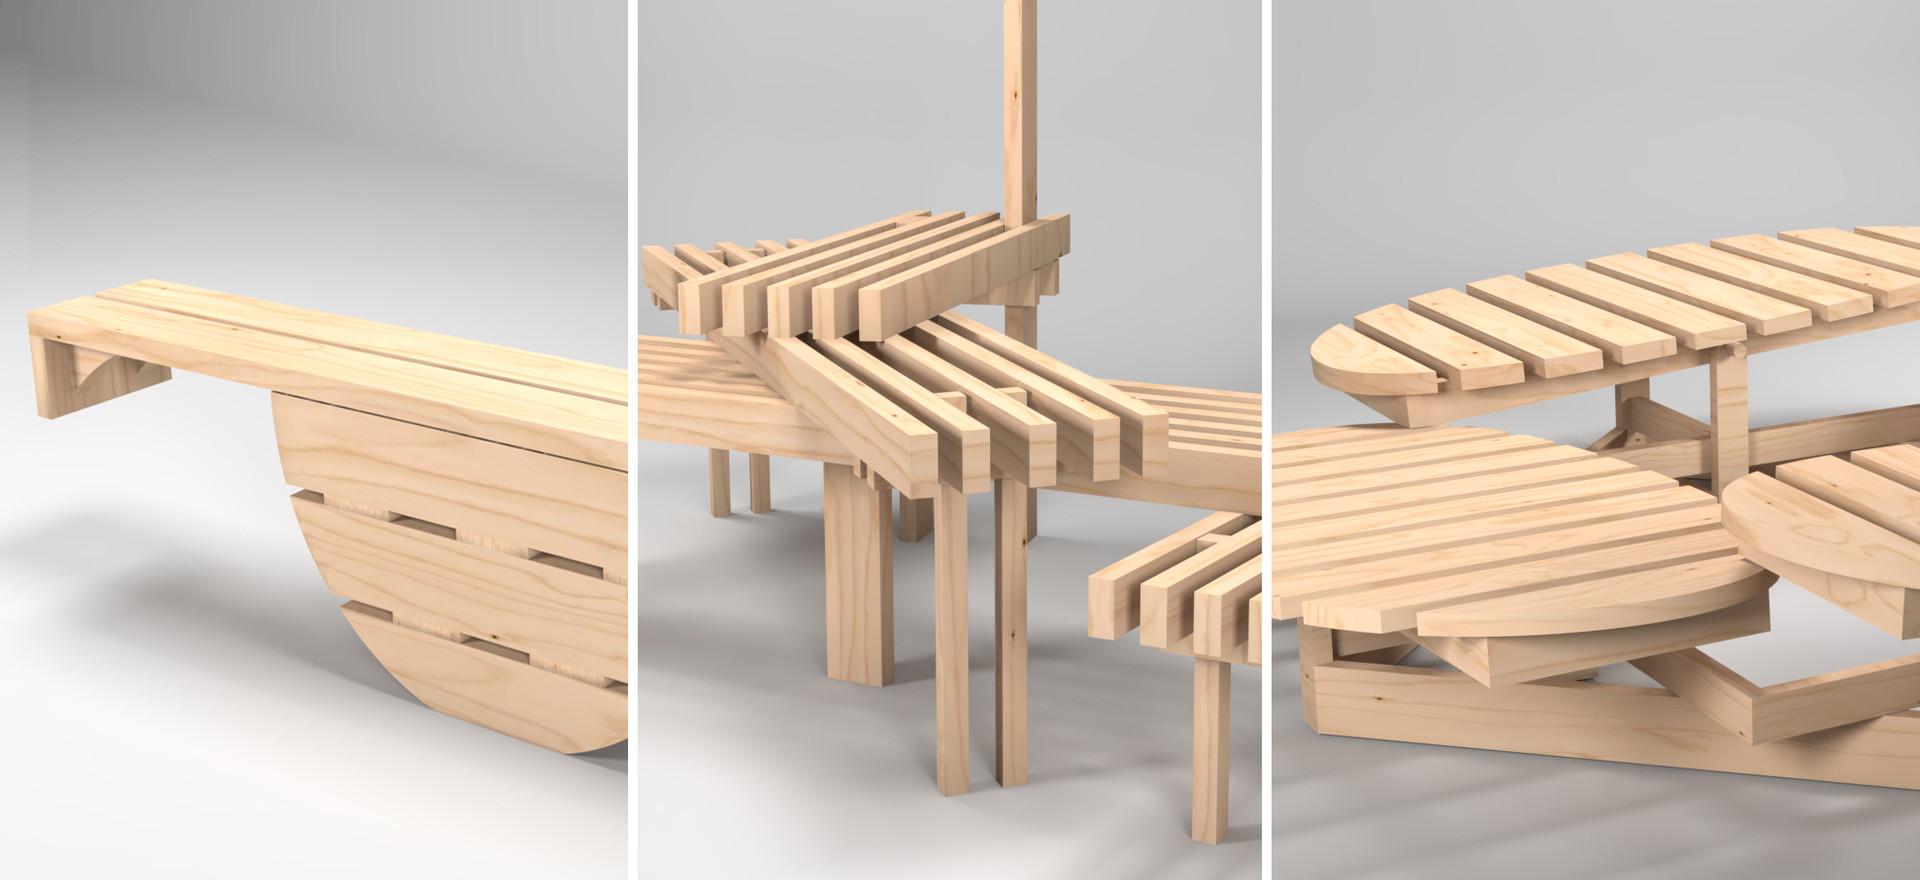 Social Distance Urban Furniture